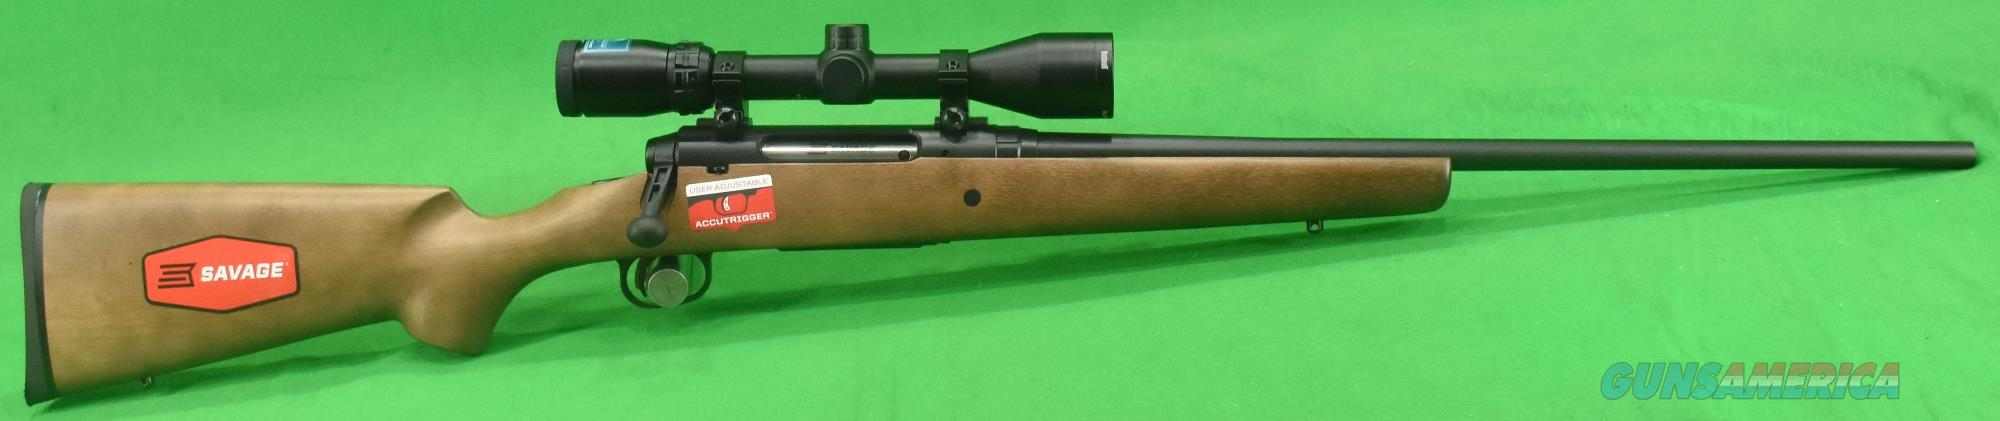 Axis II XP Hardwood 243Win 22In  22551  Guns > Rifles > Savage Rifles > Axis